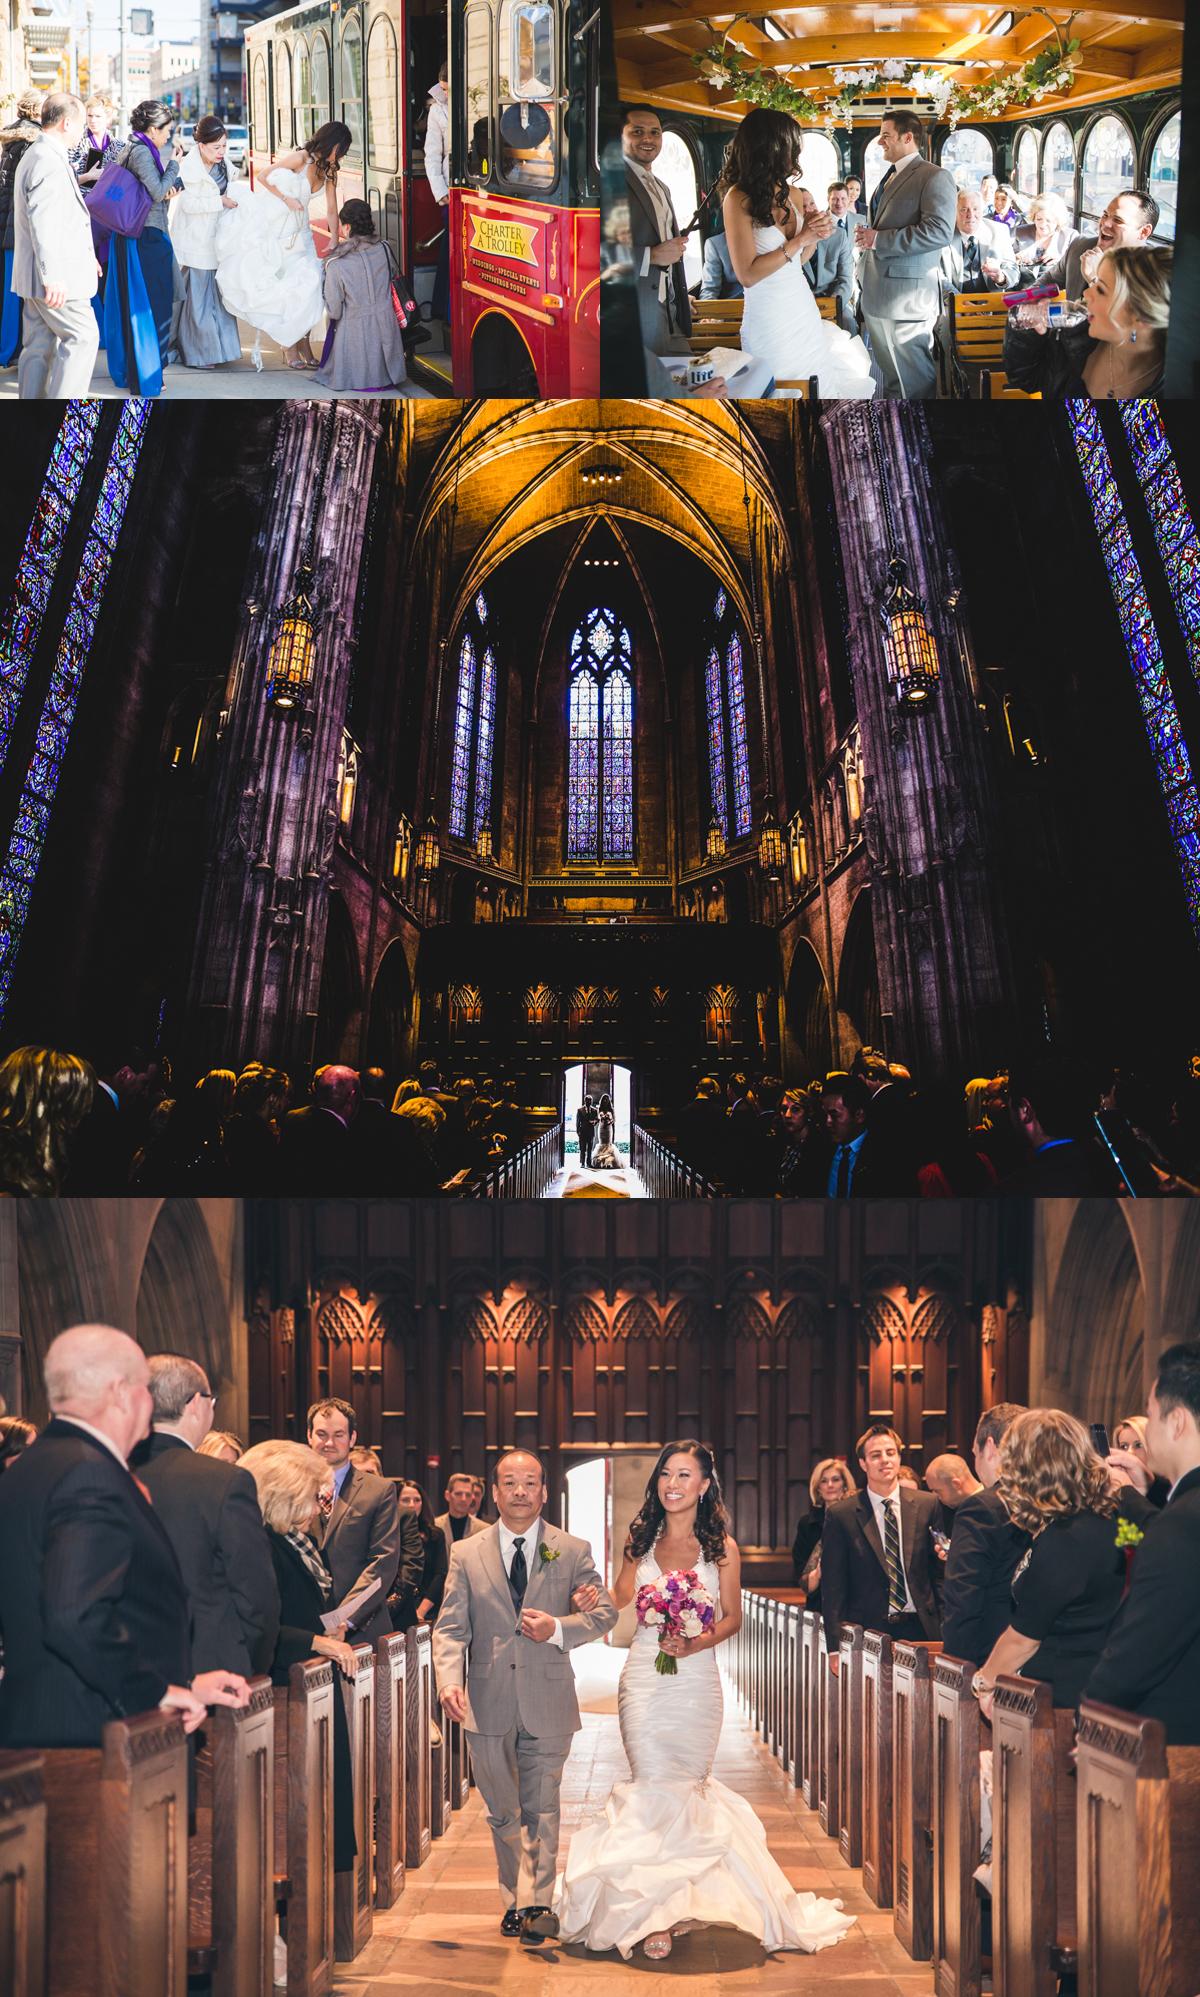 pittsburgh-wedding-photographer-kimly-james-heinz-chapel-pnc-lexus-club-tea-ceremony-10